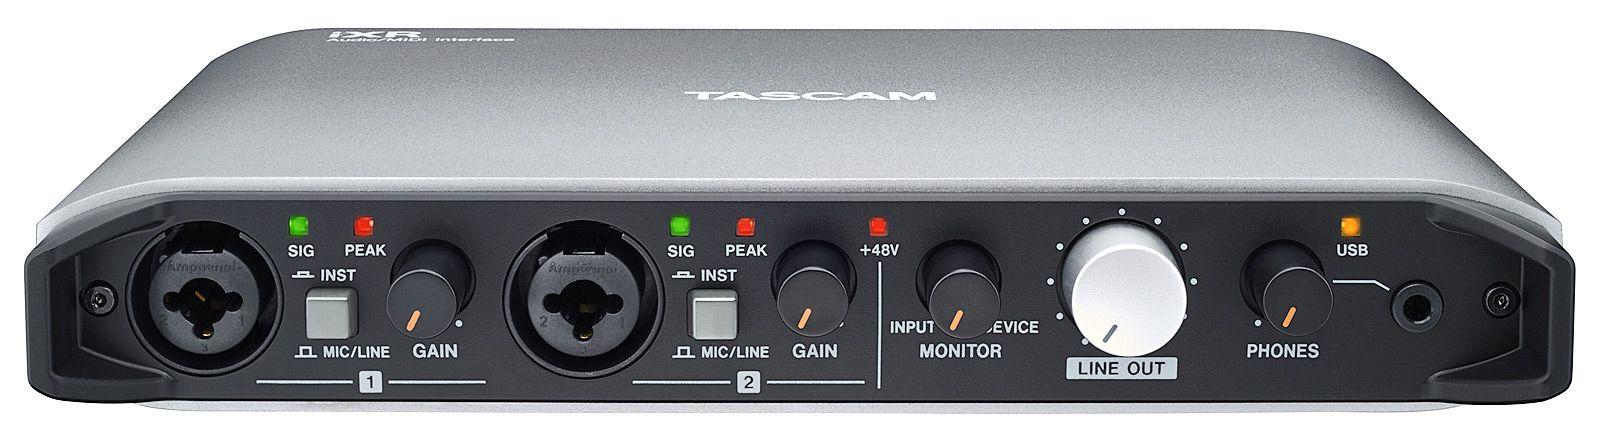 INTERFACE DE ÁUDIO USB DESKTOP / IPHONE / IPAD TASCAM IXR